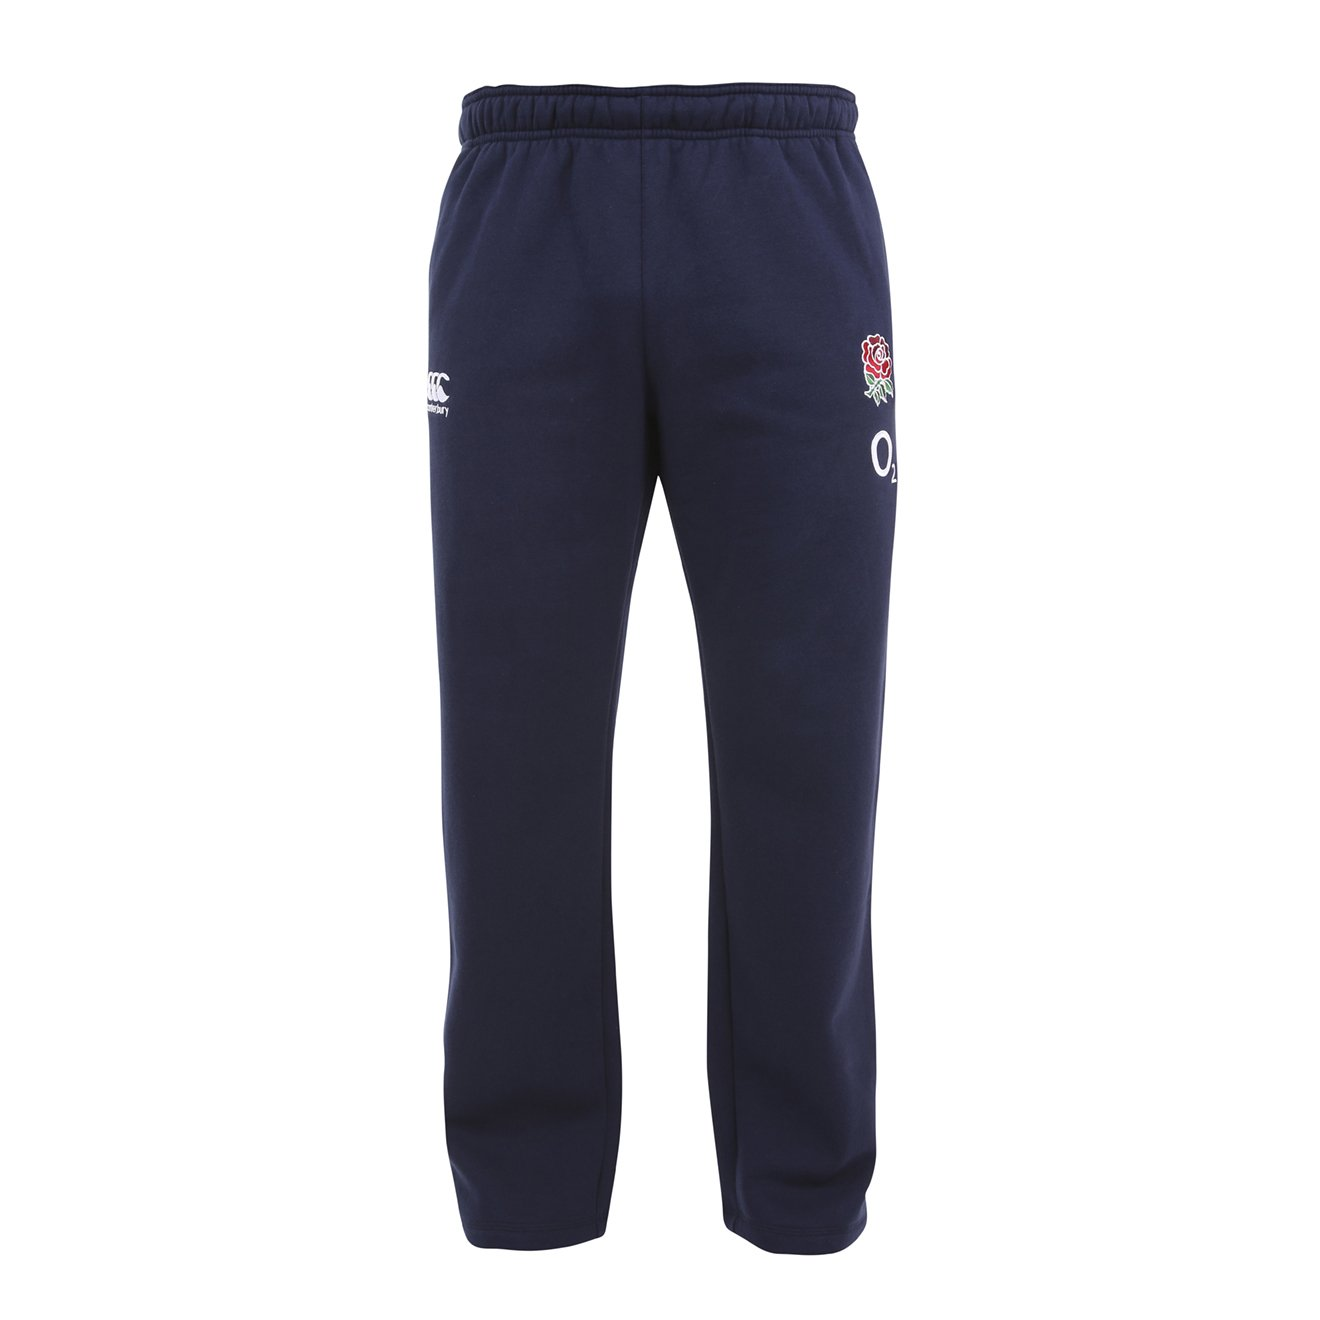 Canterbury Pantalones de chándal para Hombre, Diseño de Selección Inglesa de Rugby